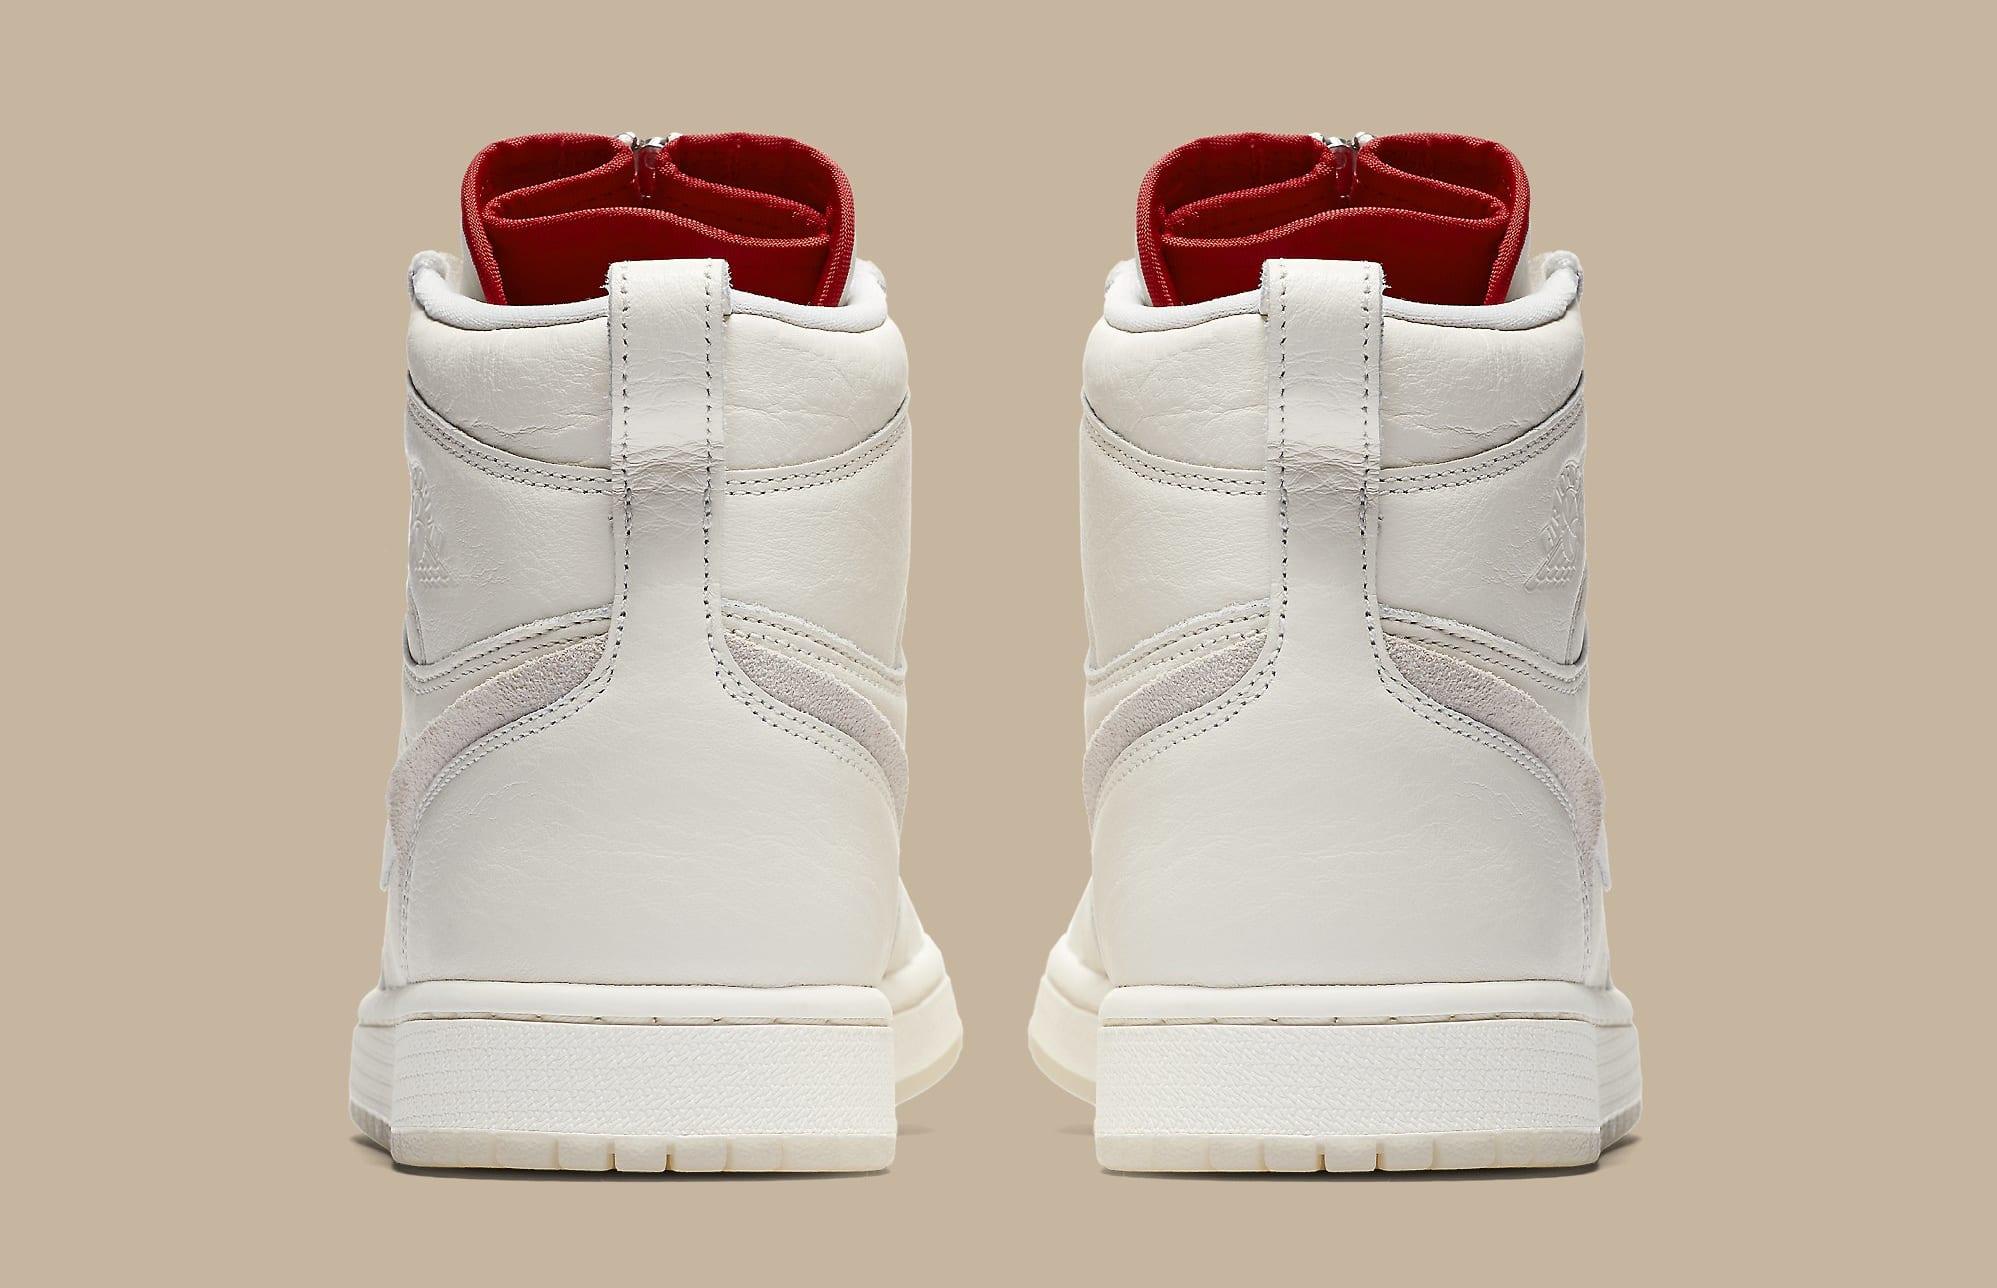 huge discount bd89c ef6f8 Picture by way of Nike Vogue x Air Jordan 1 Zip AWOK Sail Heel